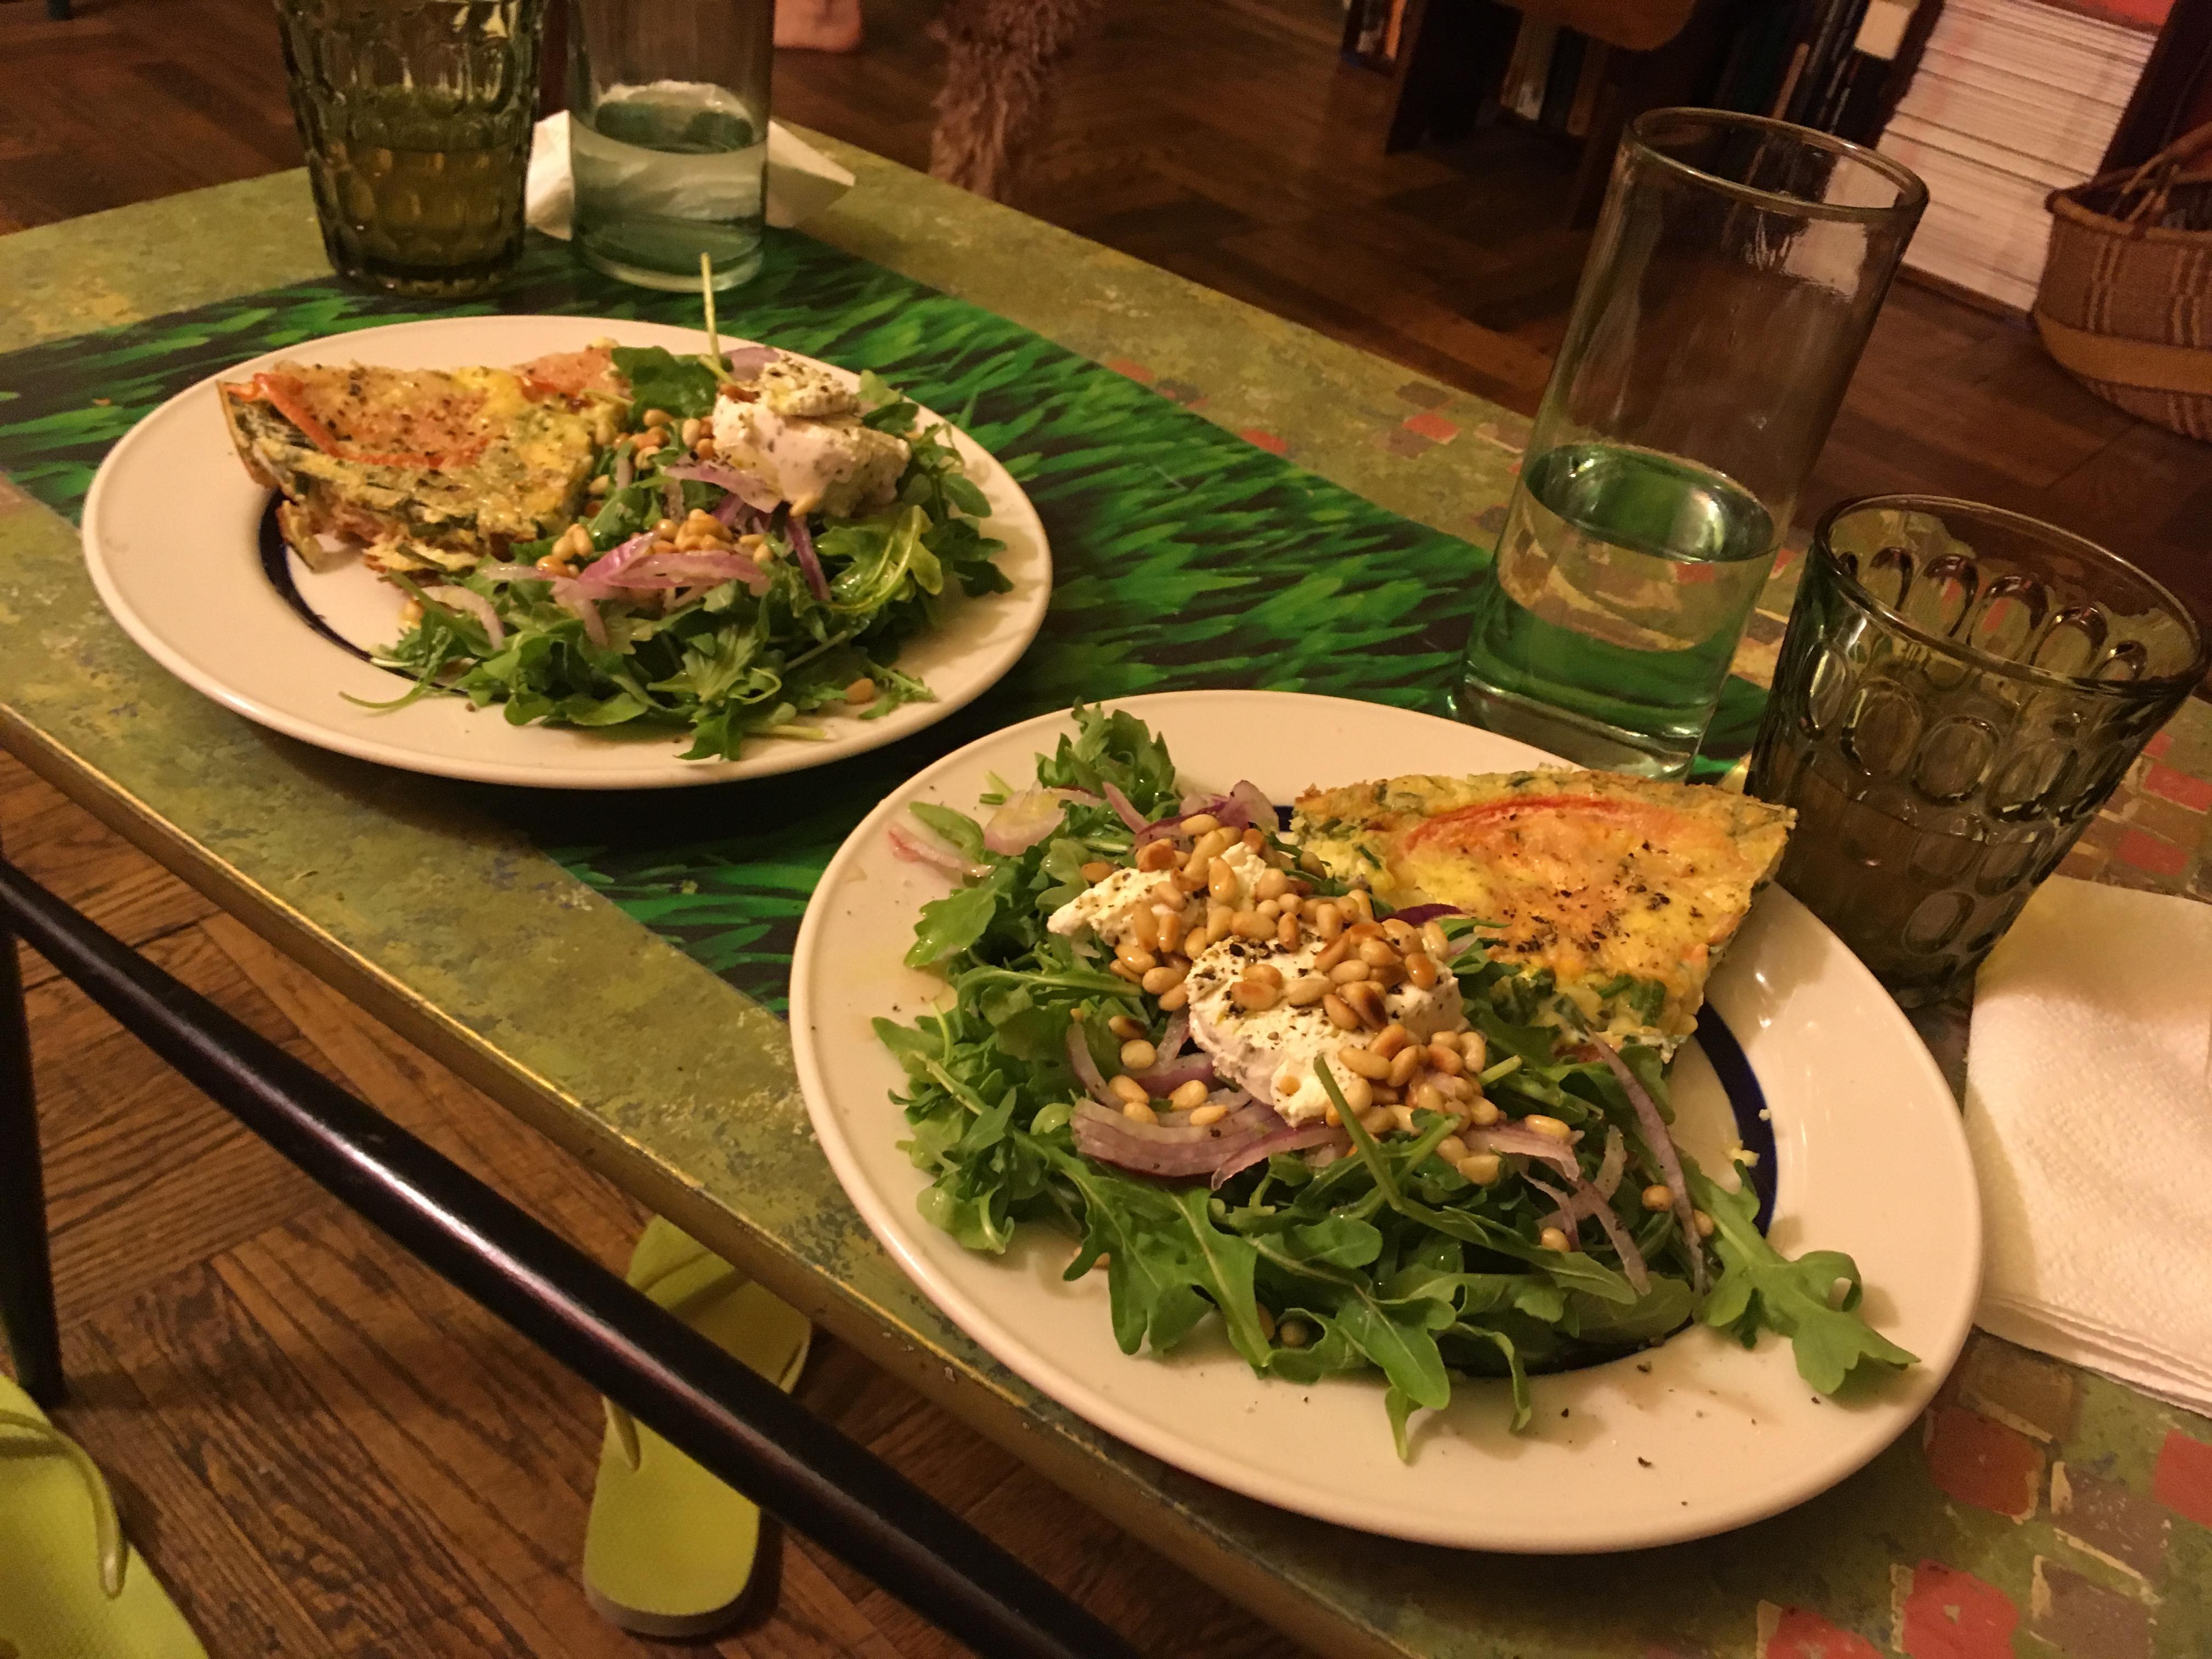 Fancy Arugula Side Salad